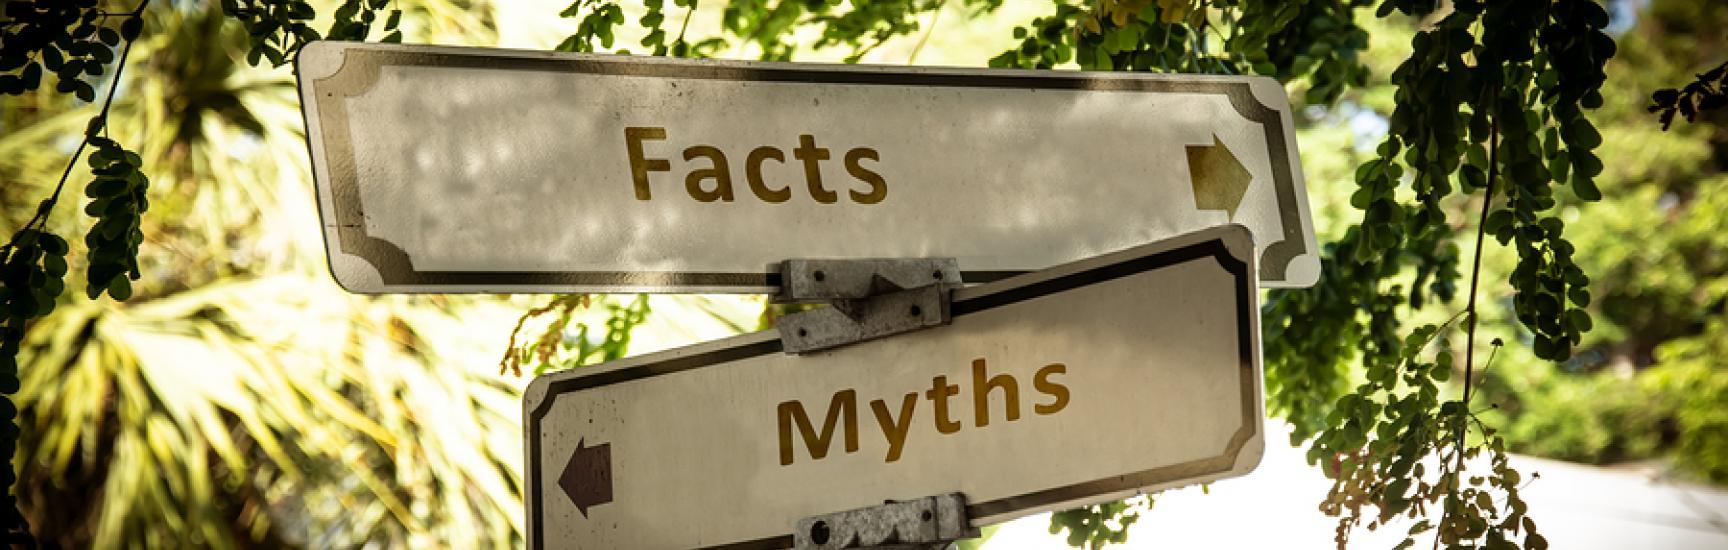 insurance myths facts surex